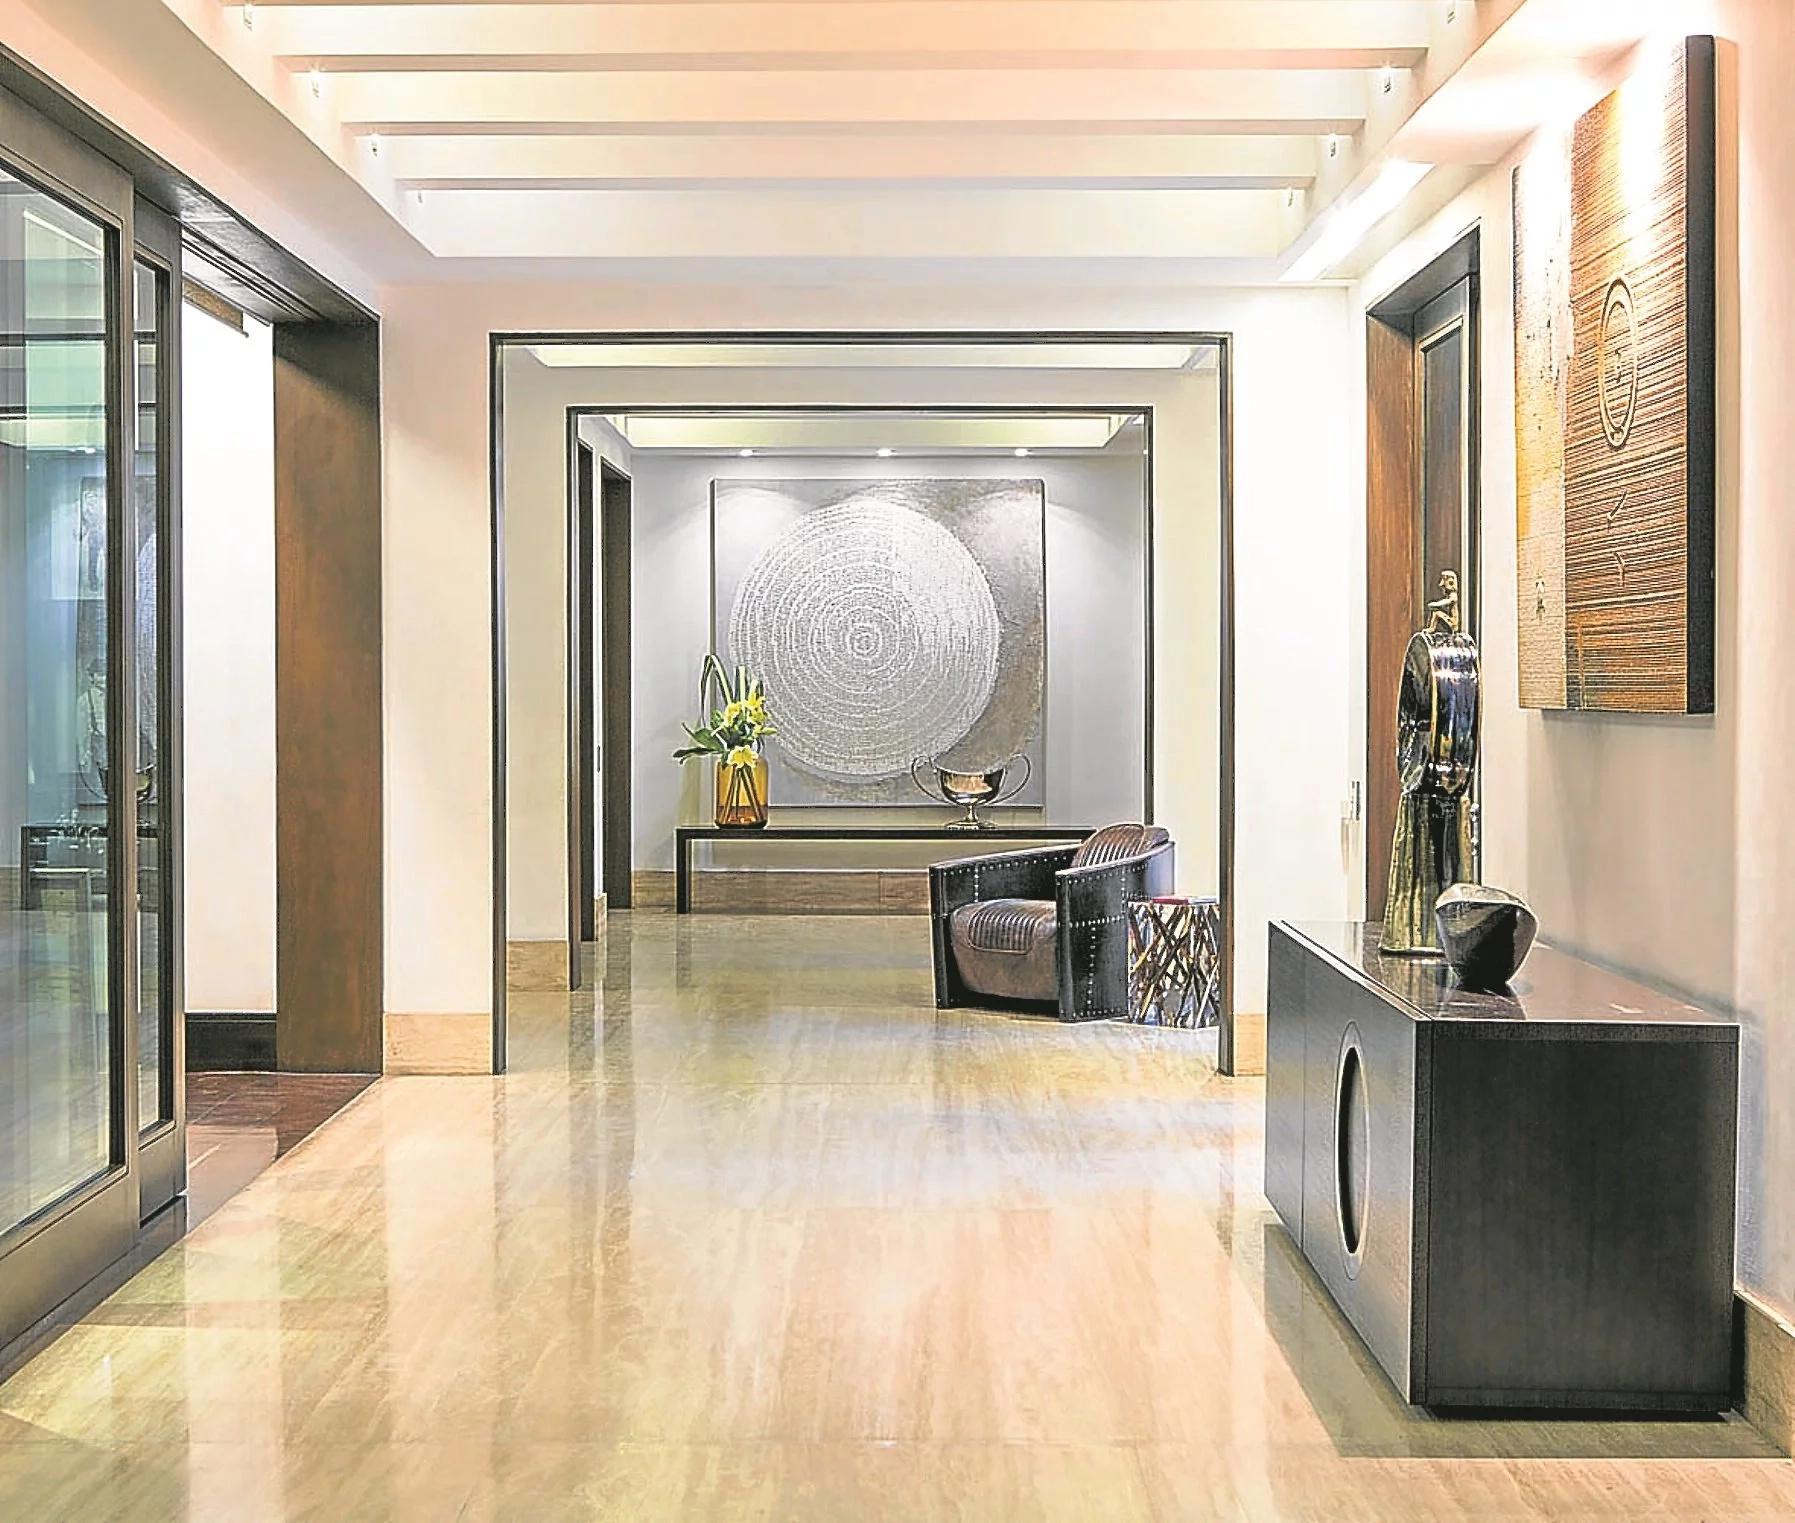 Nakakalula sa ganda at laki! Take a glimpse inside the lavish PHP388 million mansion of Manny and Jinkee Pacquiao